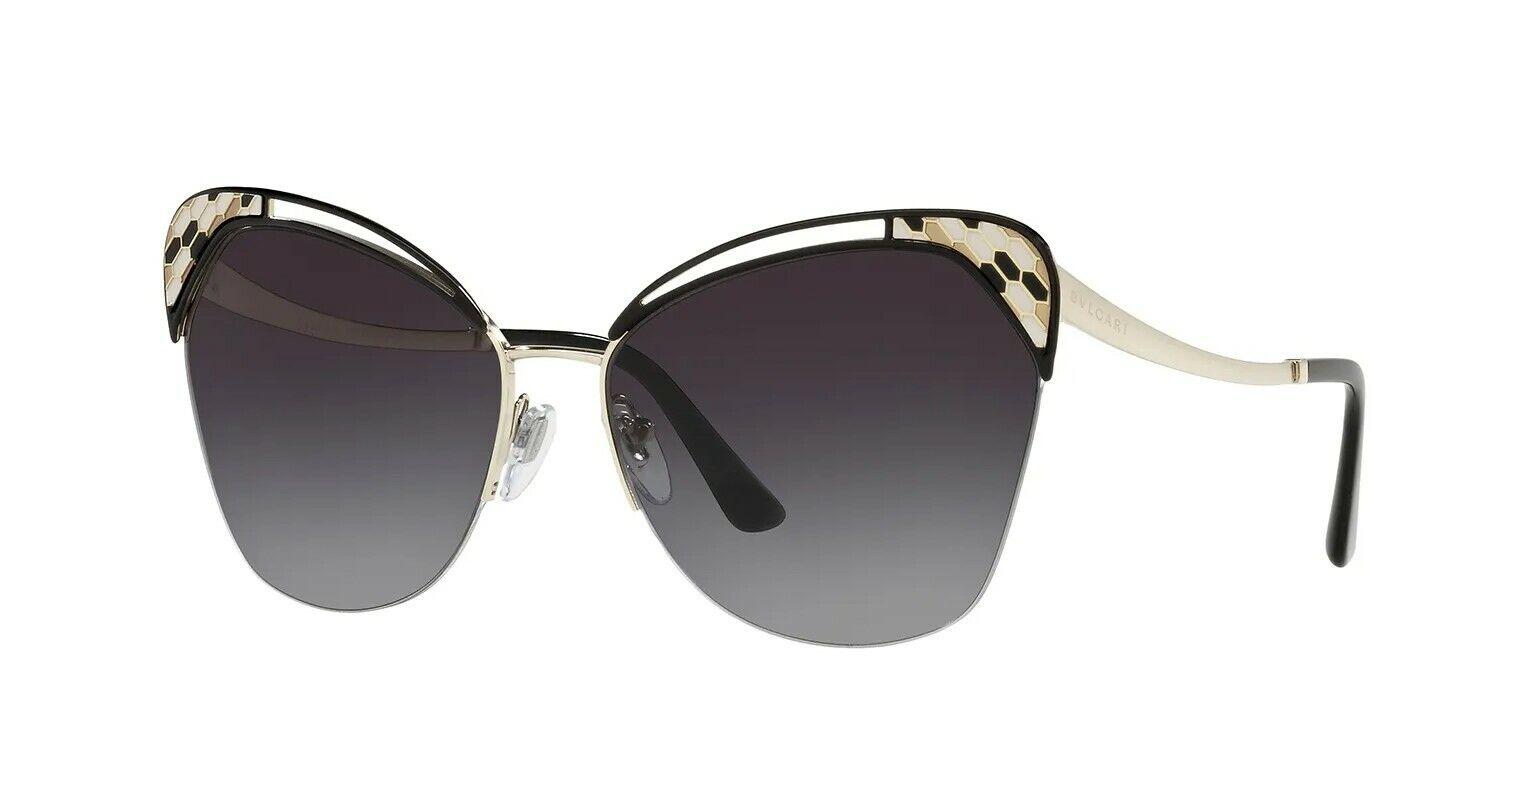 Bvlgari SERPENTI BV 6161 Gold/Grey Shaded (278/8G) Sunglasses